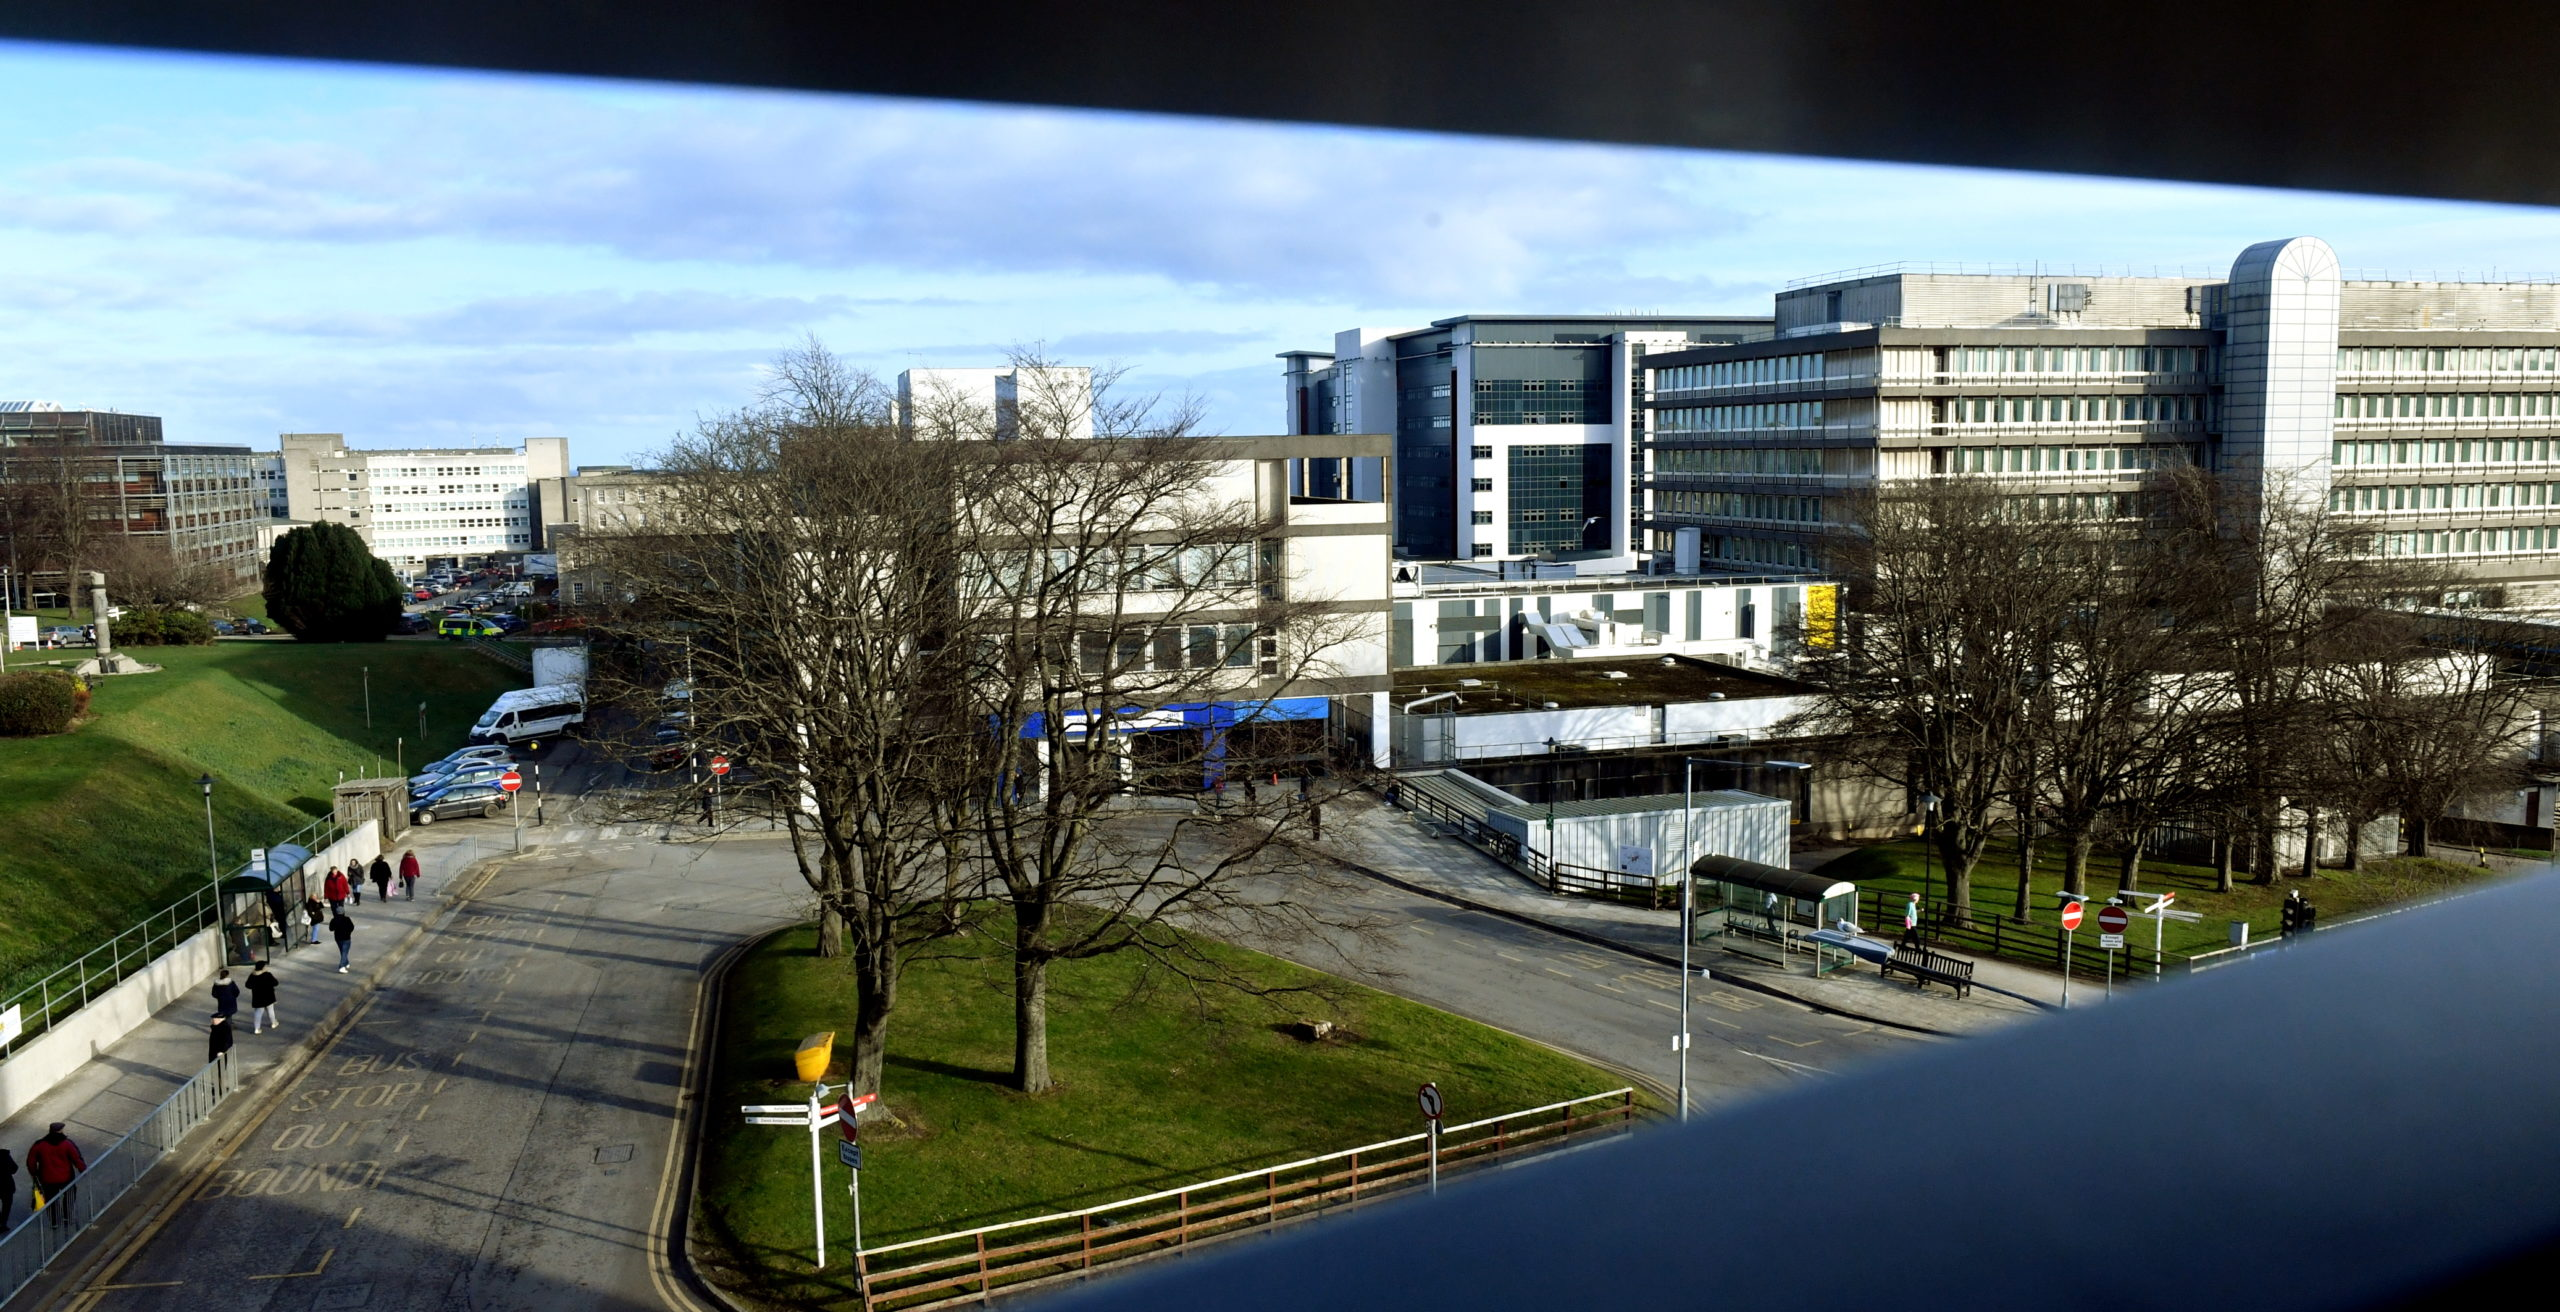 Aberdeen Royal Infirmary, NHS Grampian.